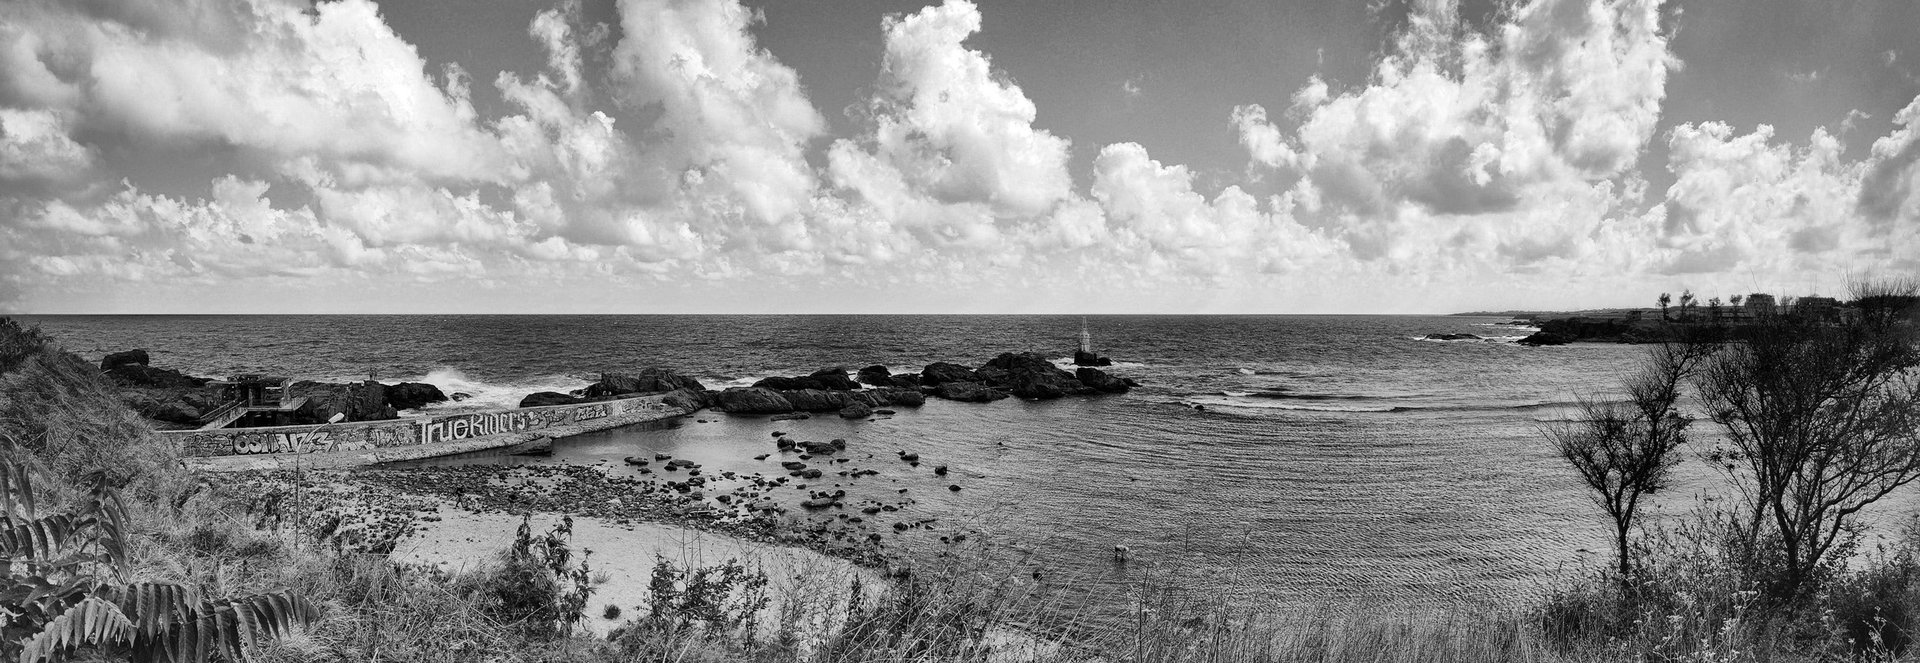 Заливът Ахтопол   Author vess.co   PHOTO FORUM